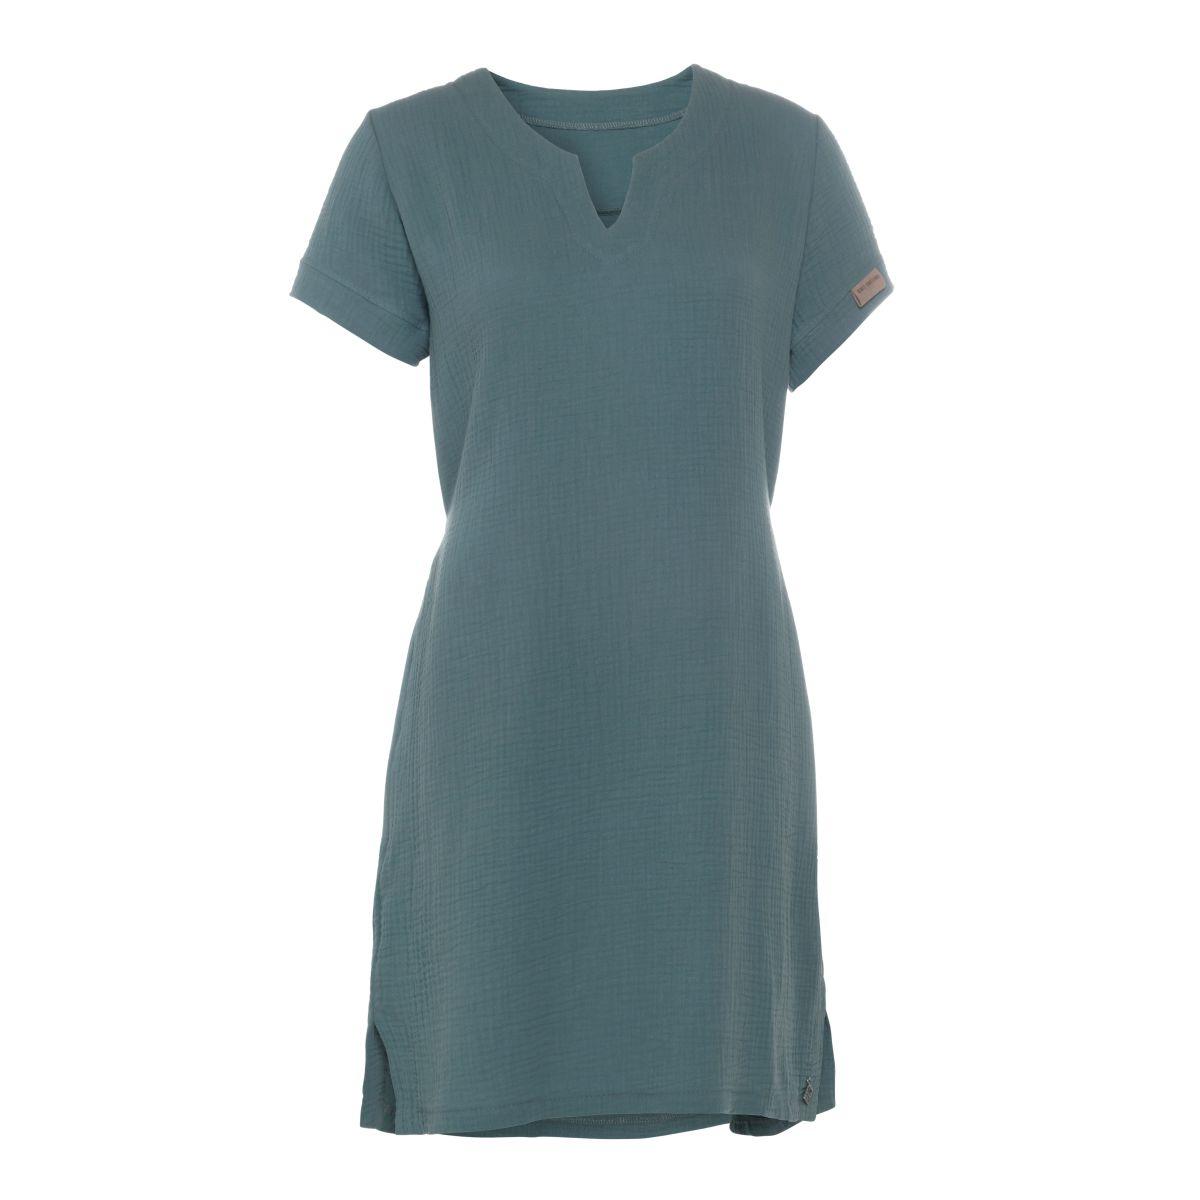 knit factory kf15012000949 indy jurk stone green s 1